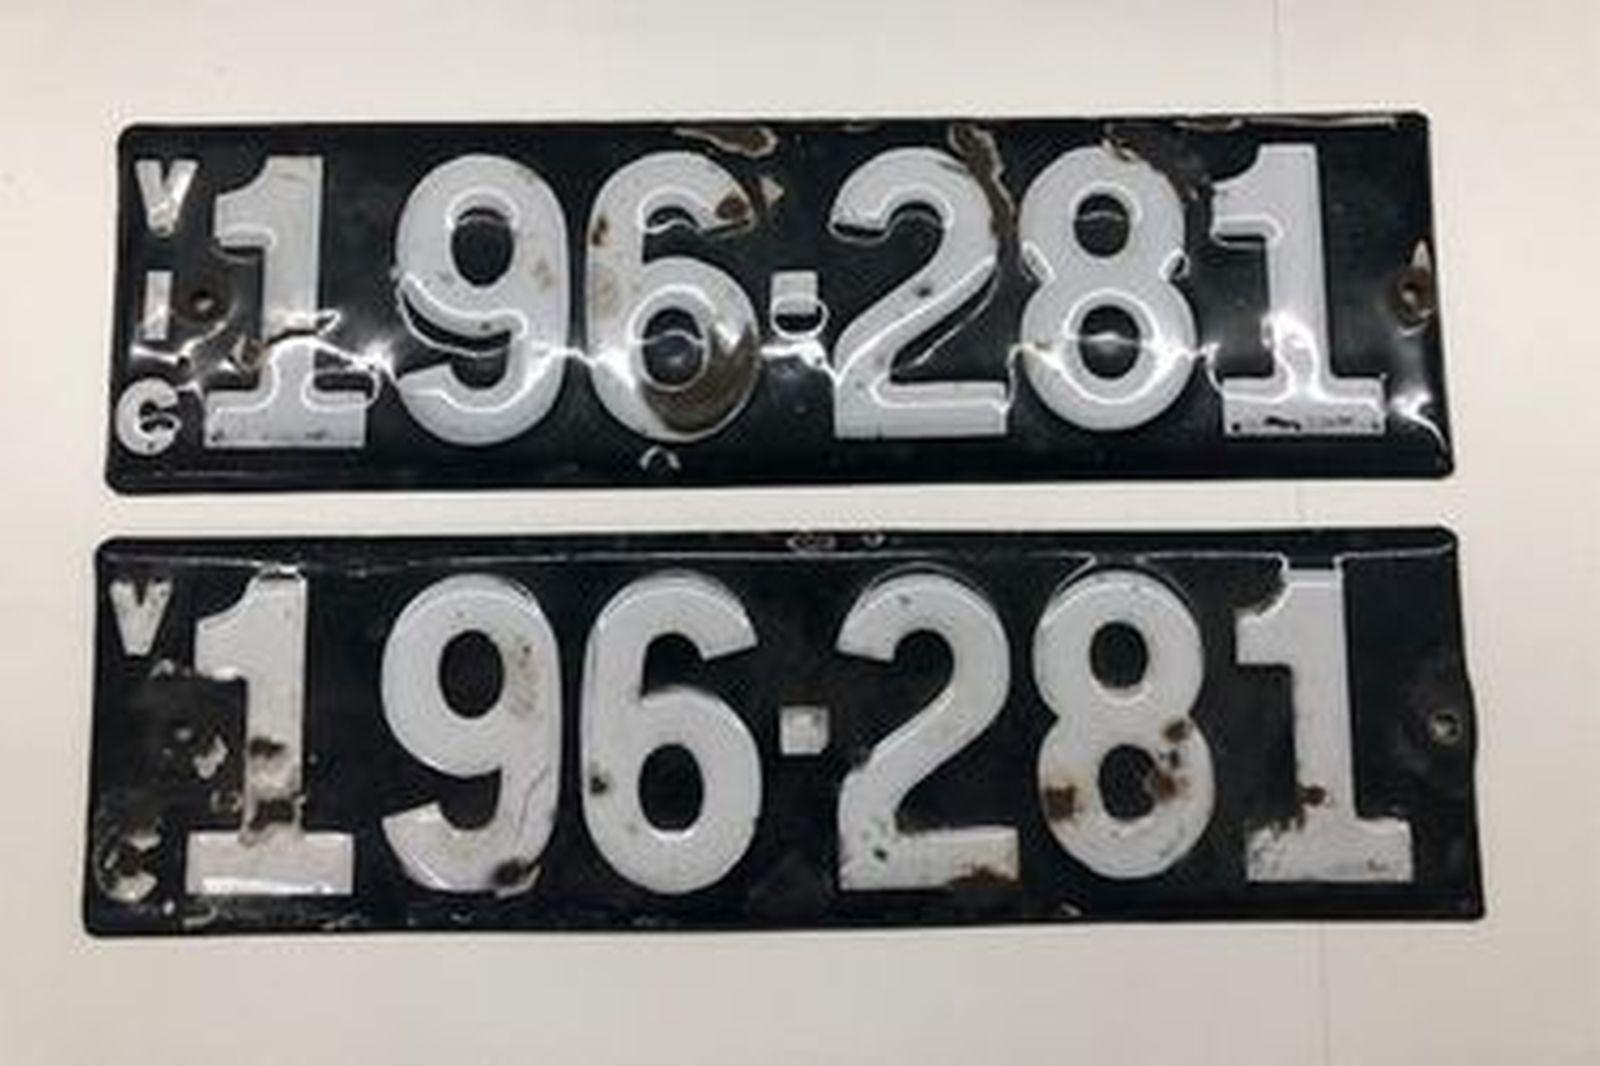 Heritage Numerical Number Plates - 196.281